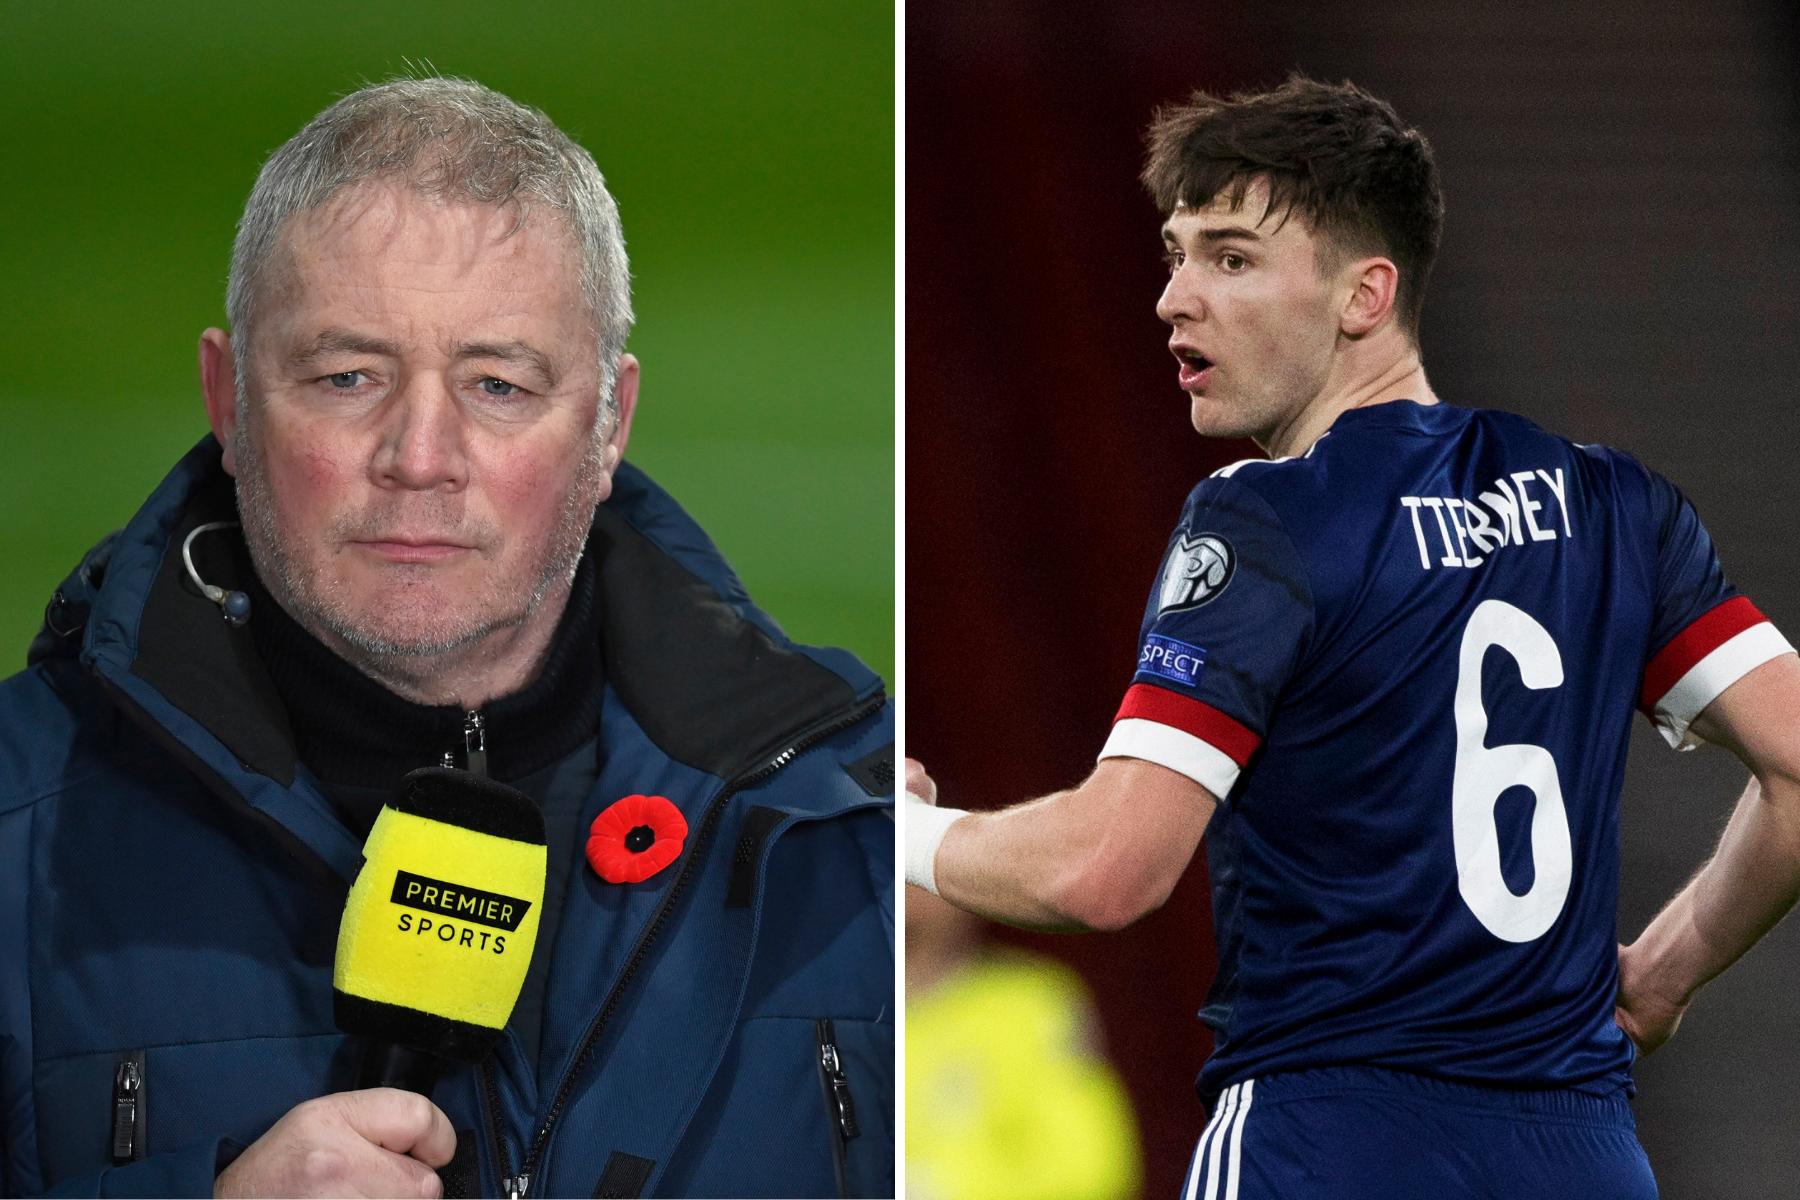 Rangers hero Ally McCoist shuts down talkSPORT pundit over startling Kieran Tierney injury claim